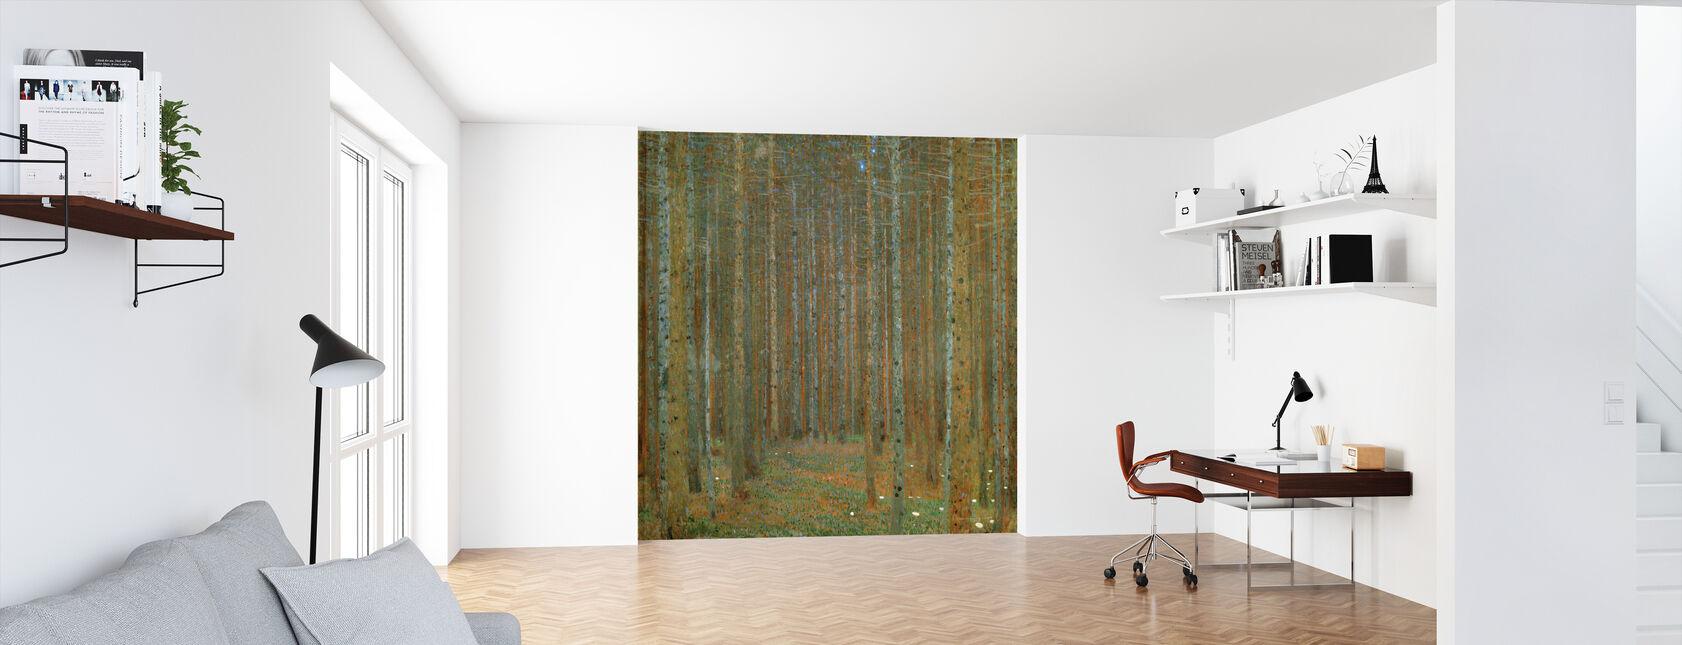 Klimt, Gustav - Fir Forest I - Wallpaper - Office